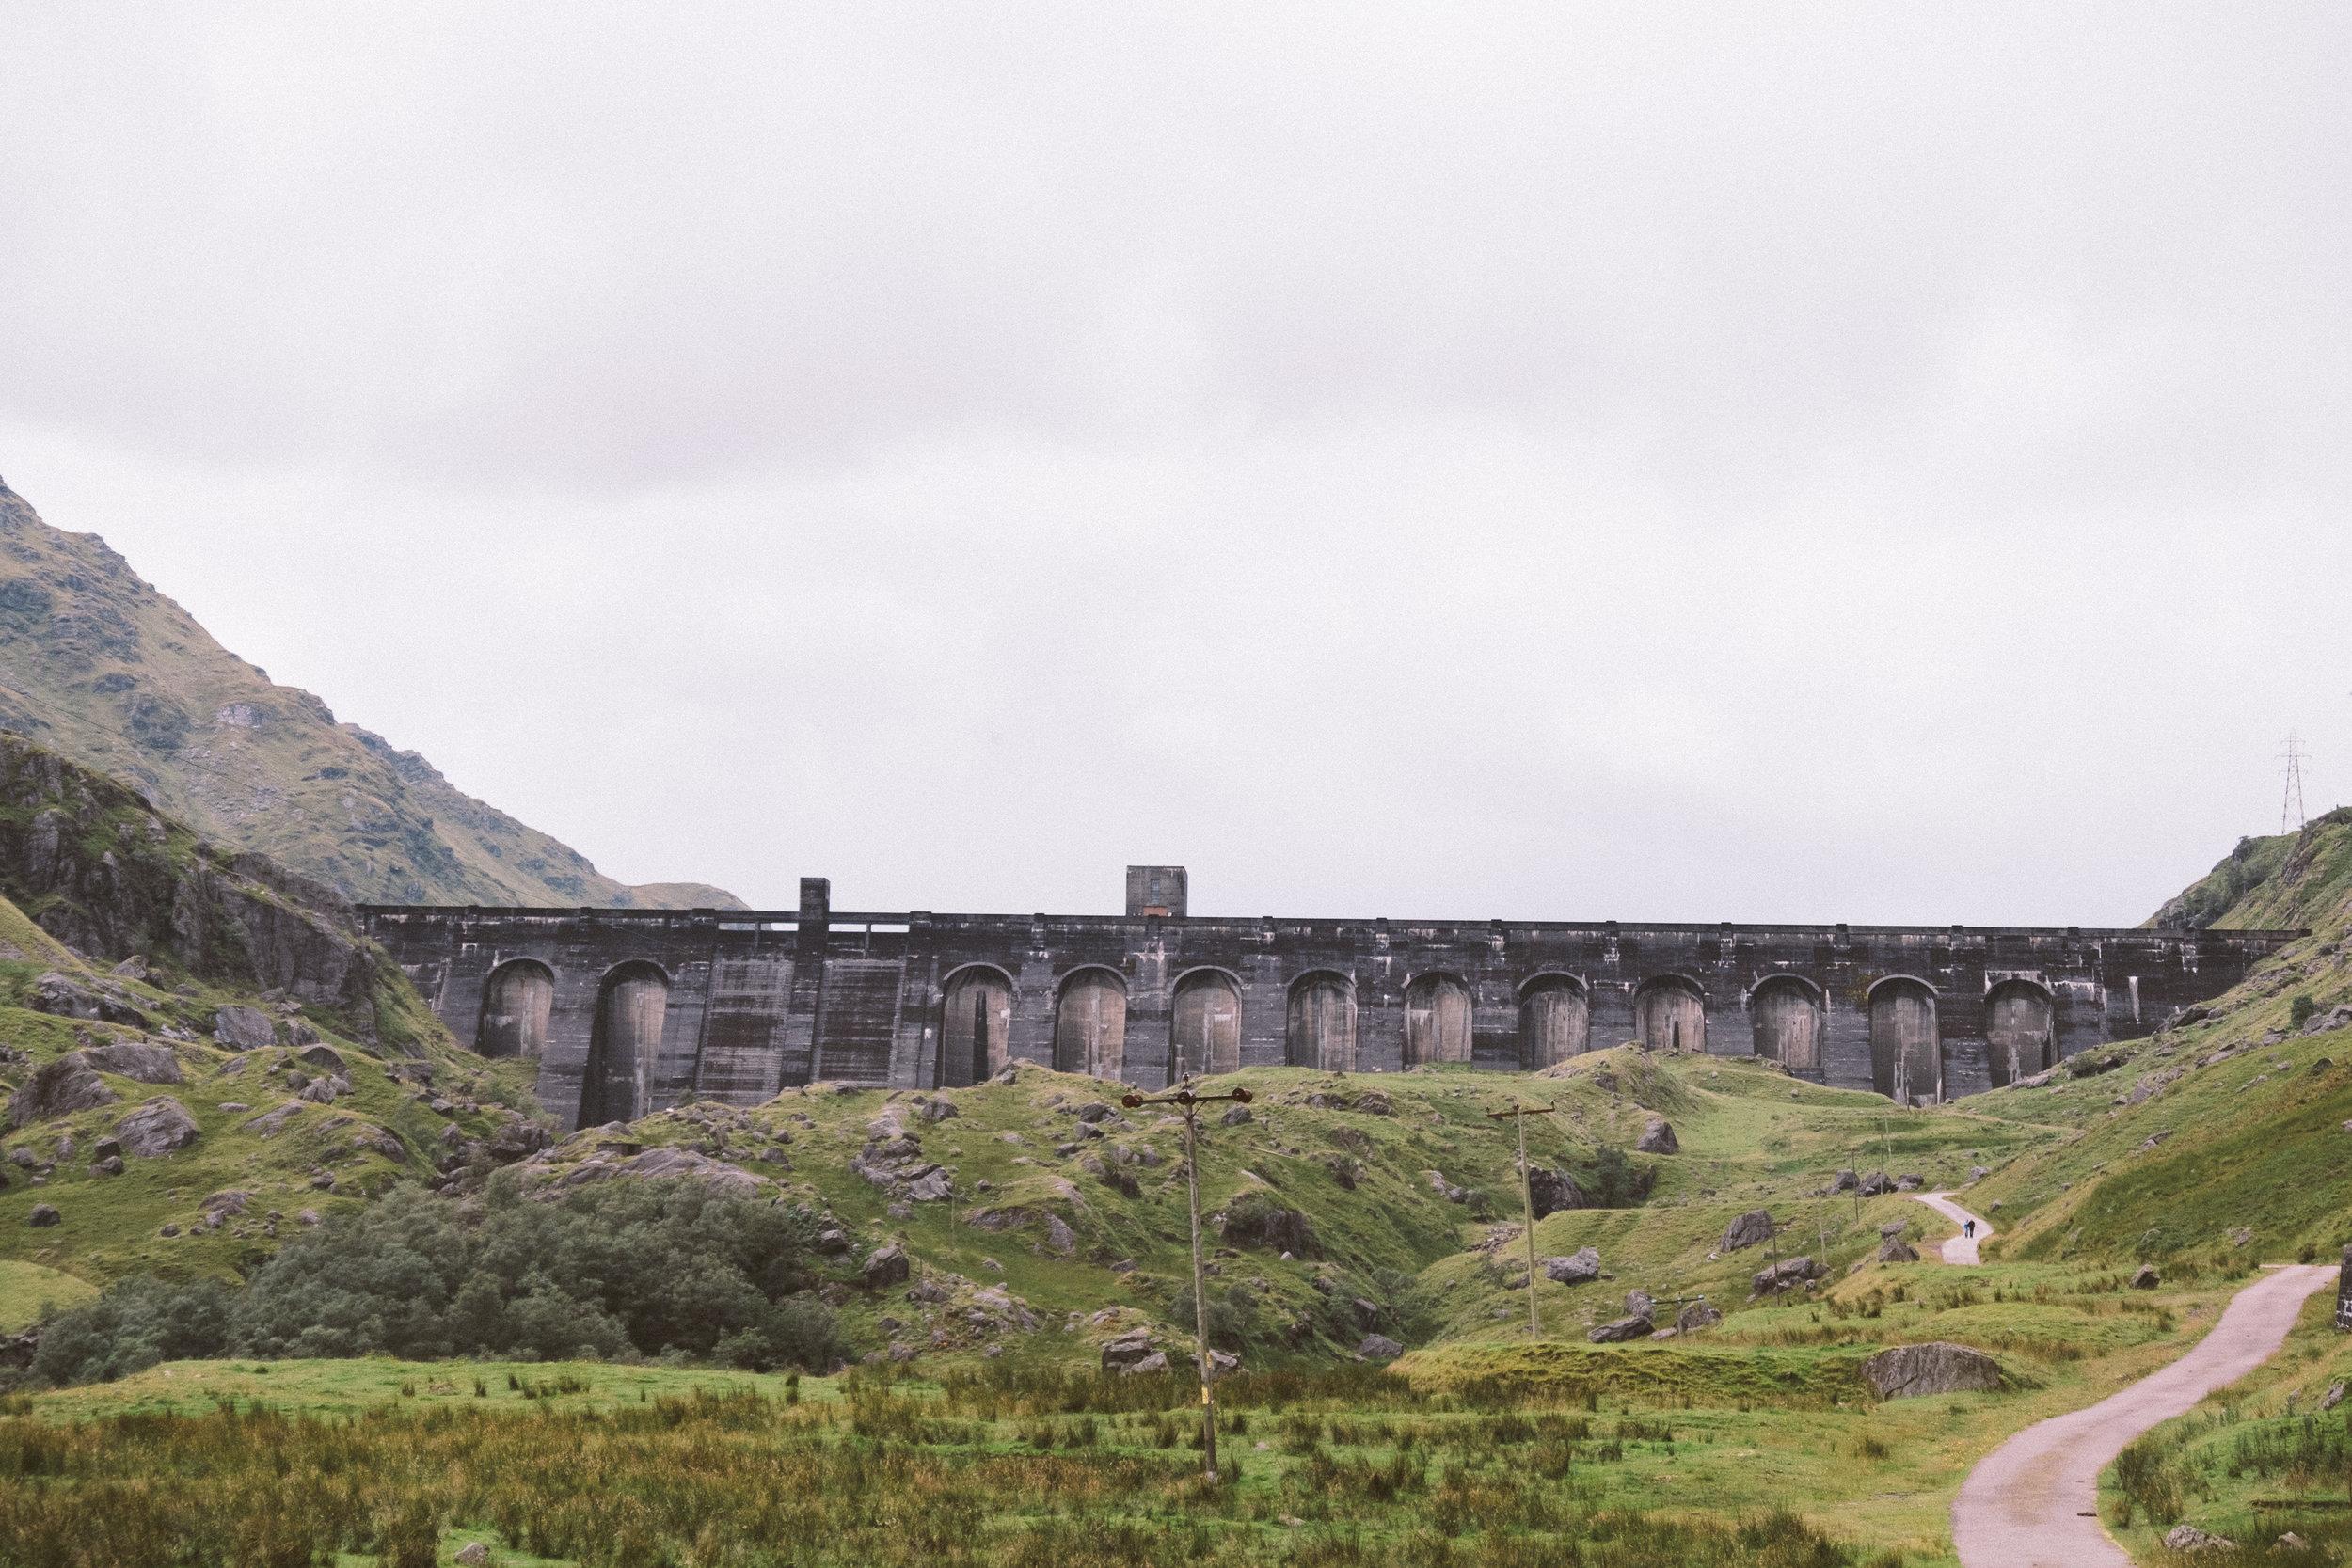 fat_creative_travel_blog_loch_sloy_easy_hike_scotland-16.jpg